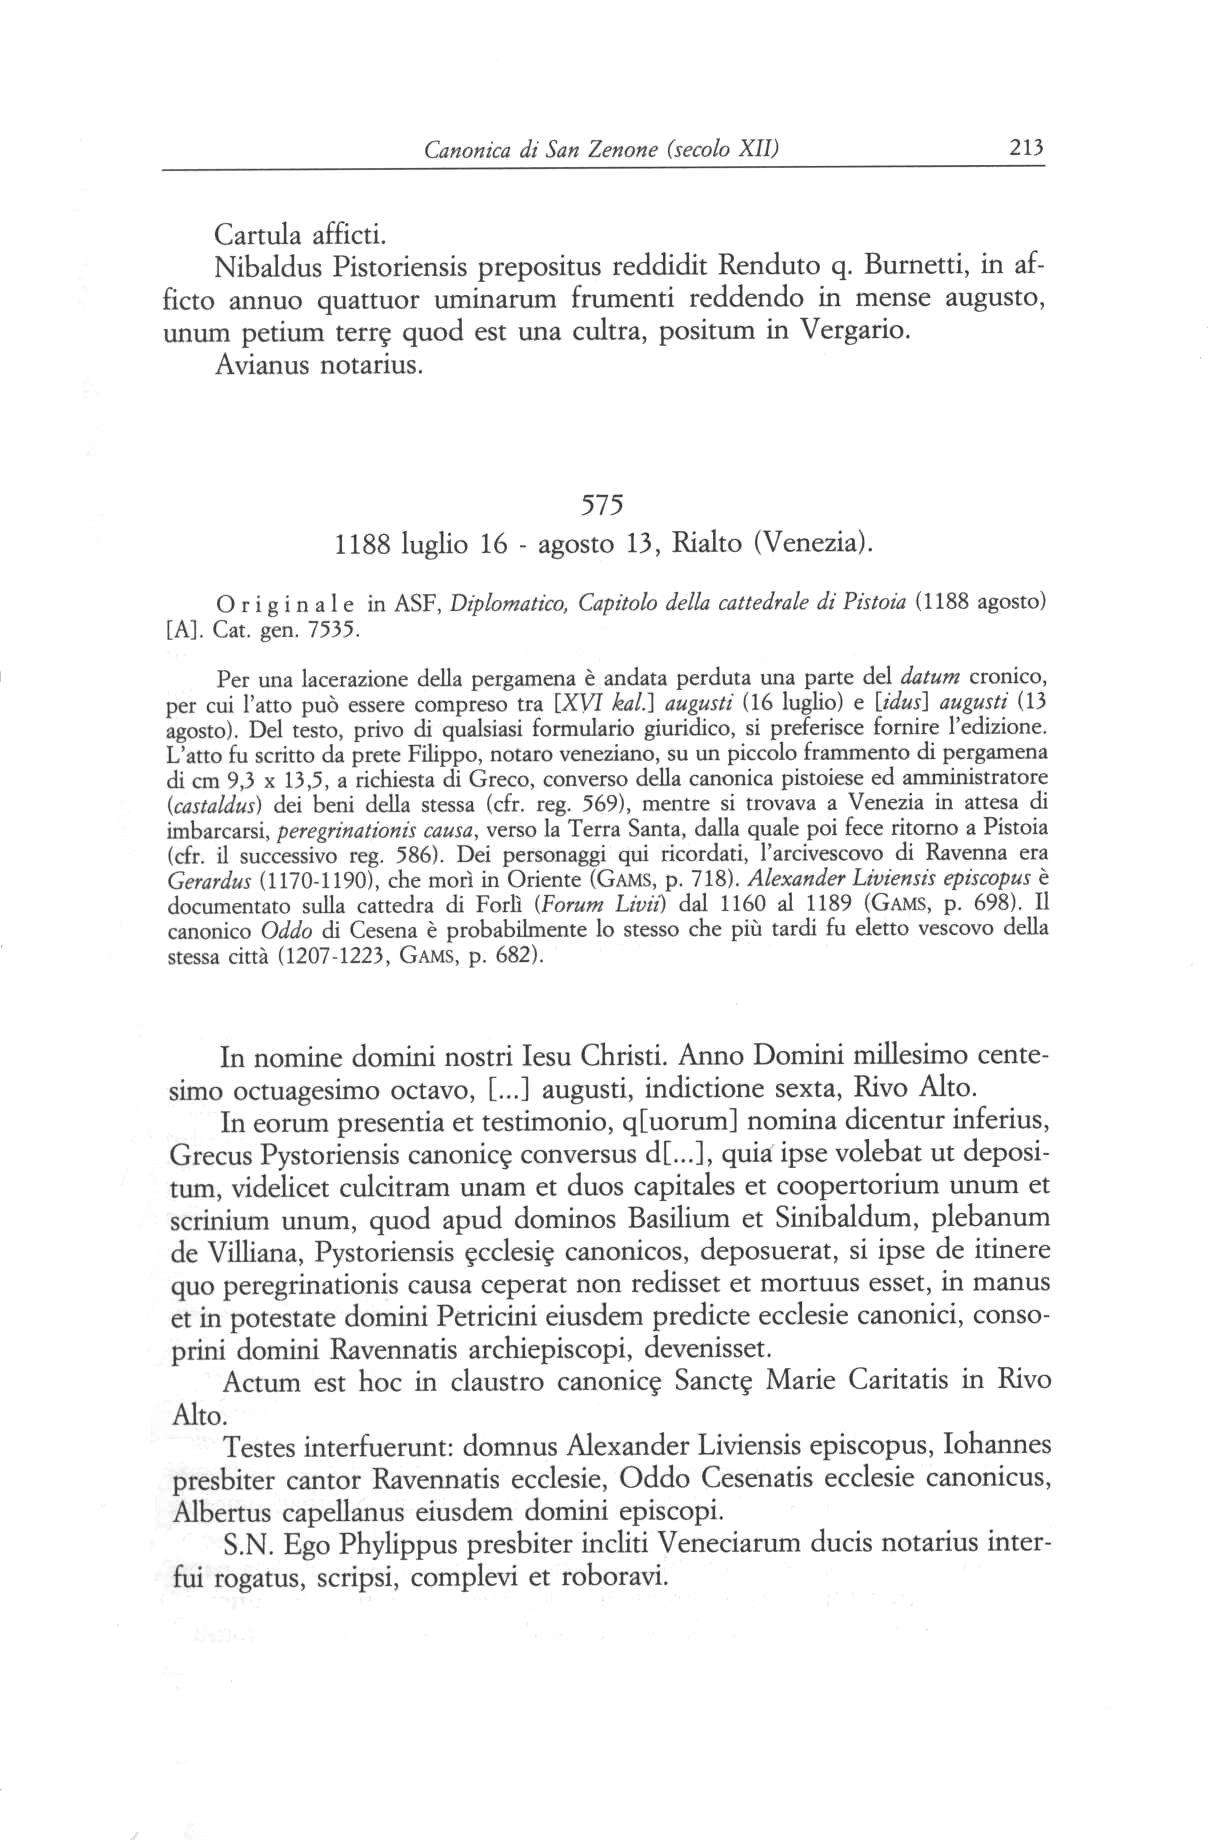 Canonica S. Zenone XII 0213.jpg